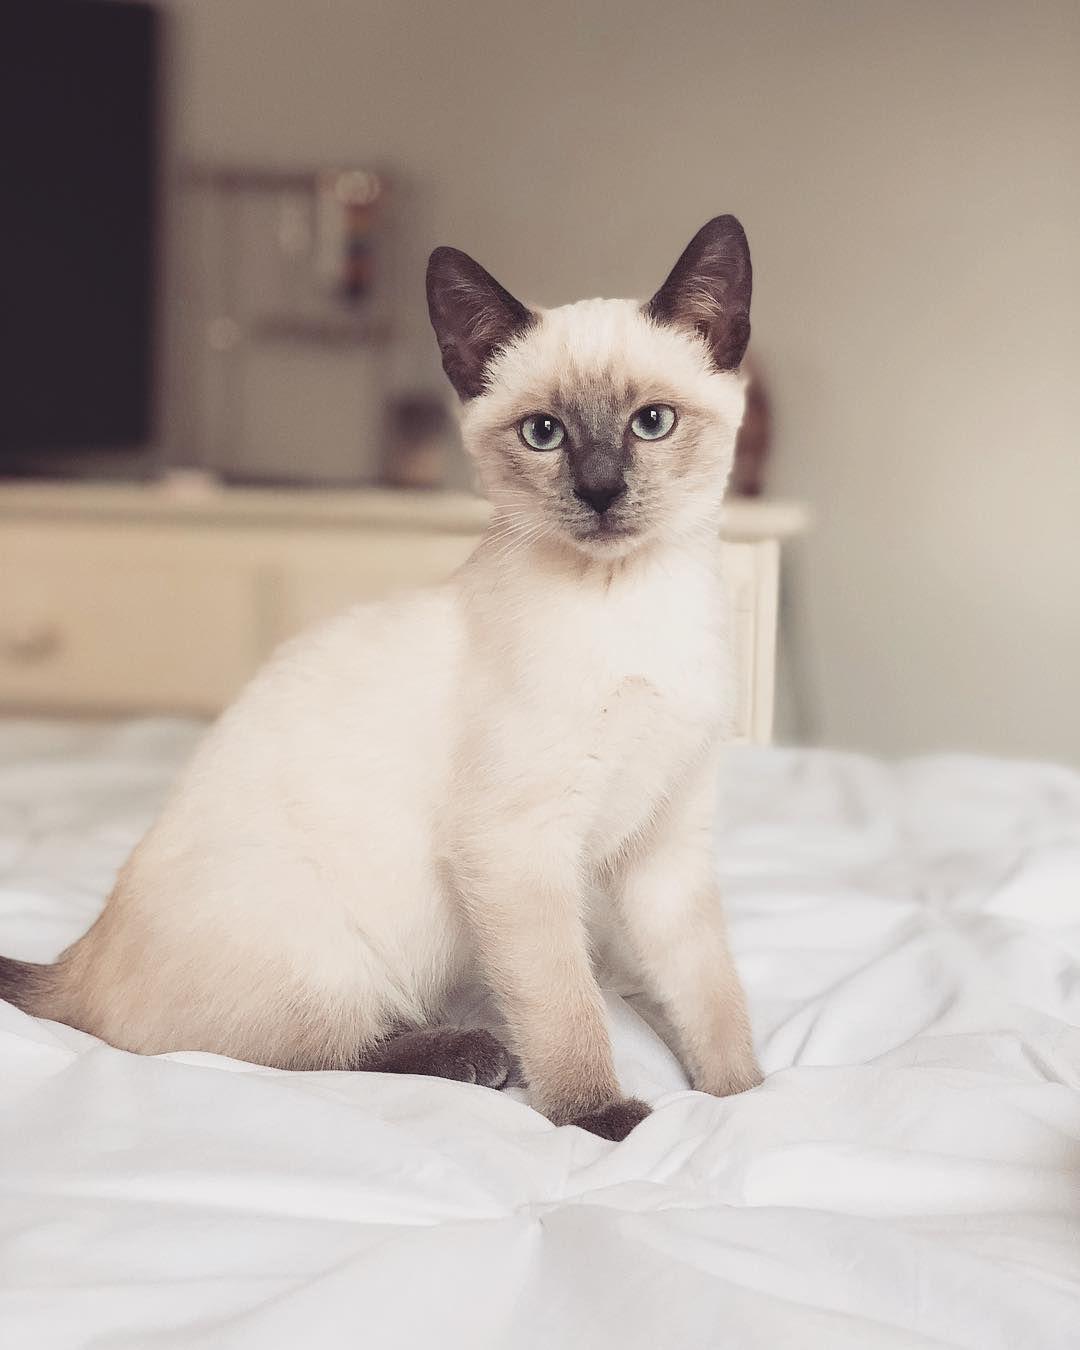 7 Jenis Kucing Yang Punya Umur Panjang